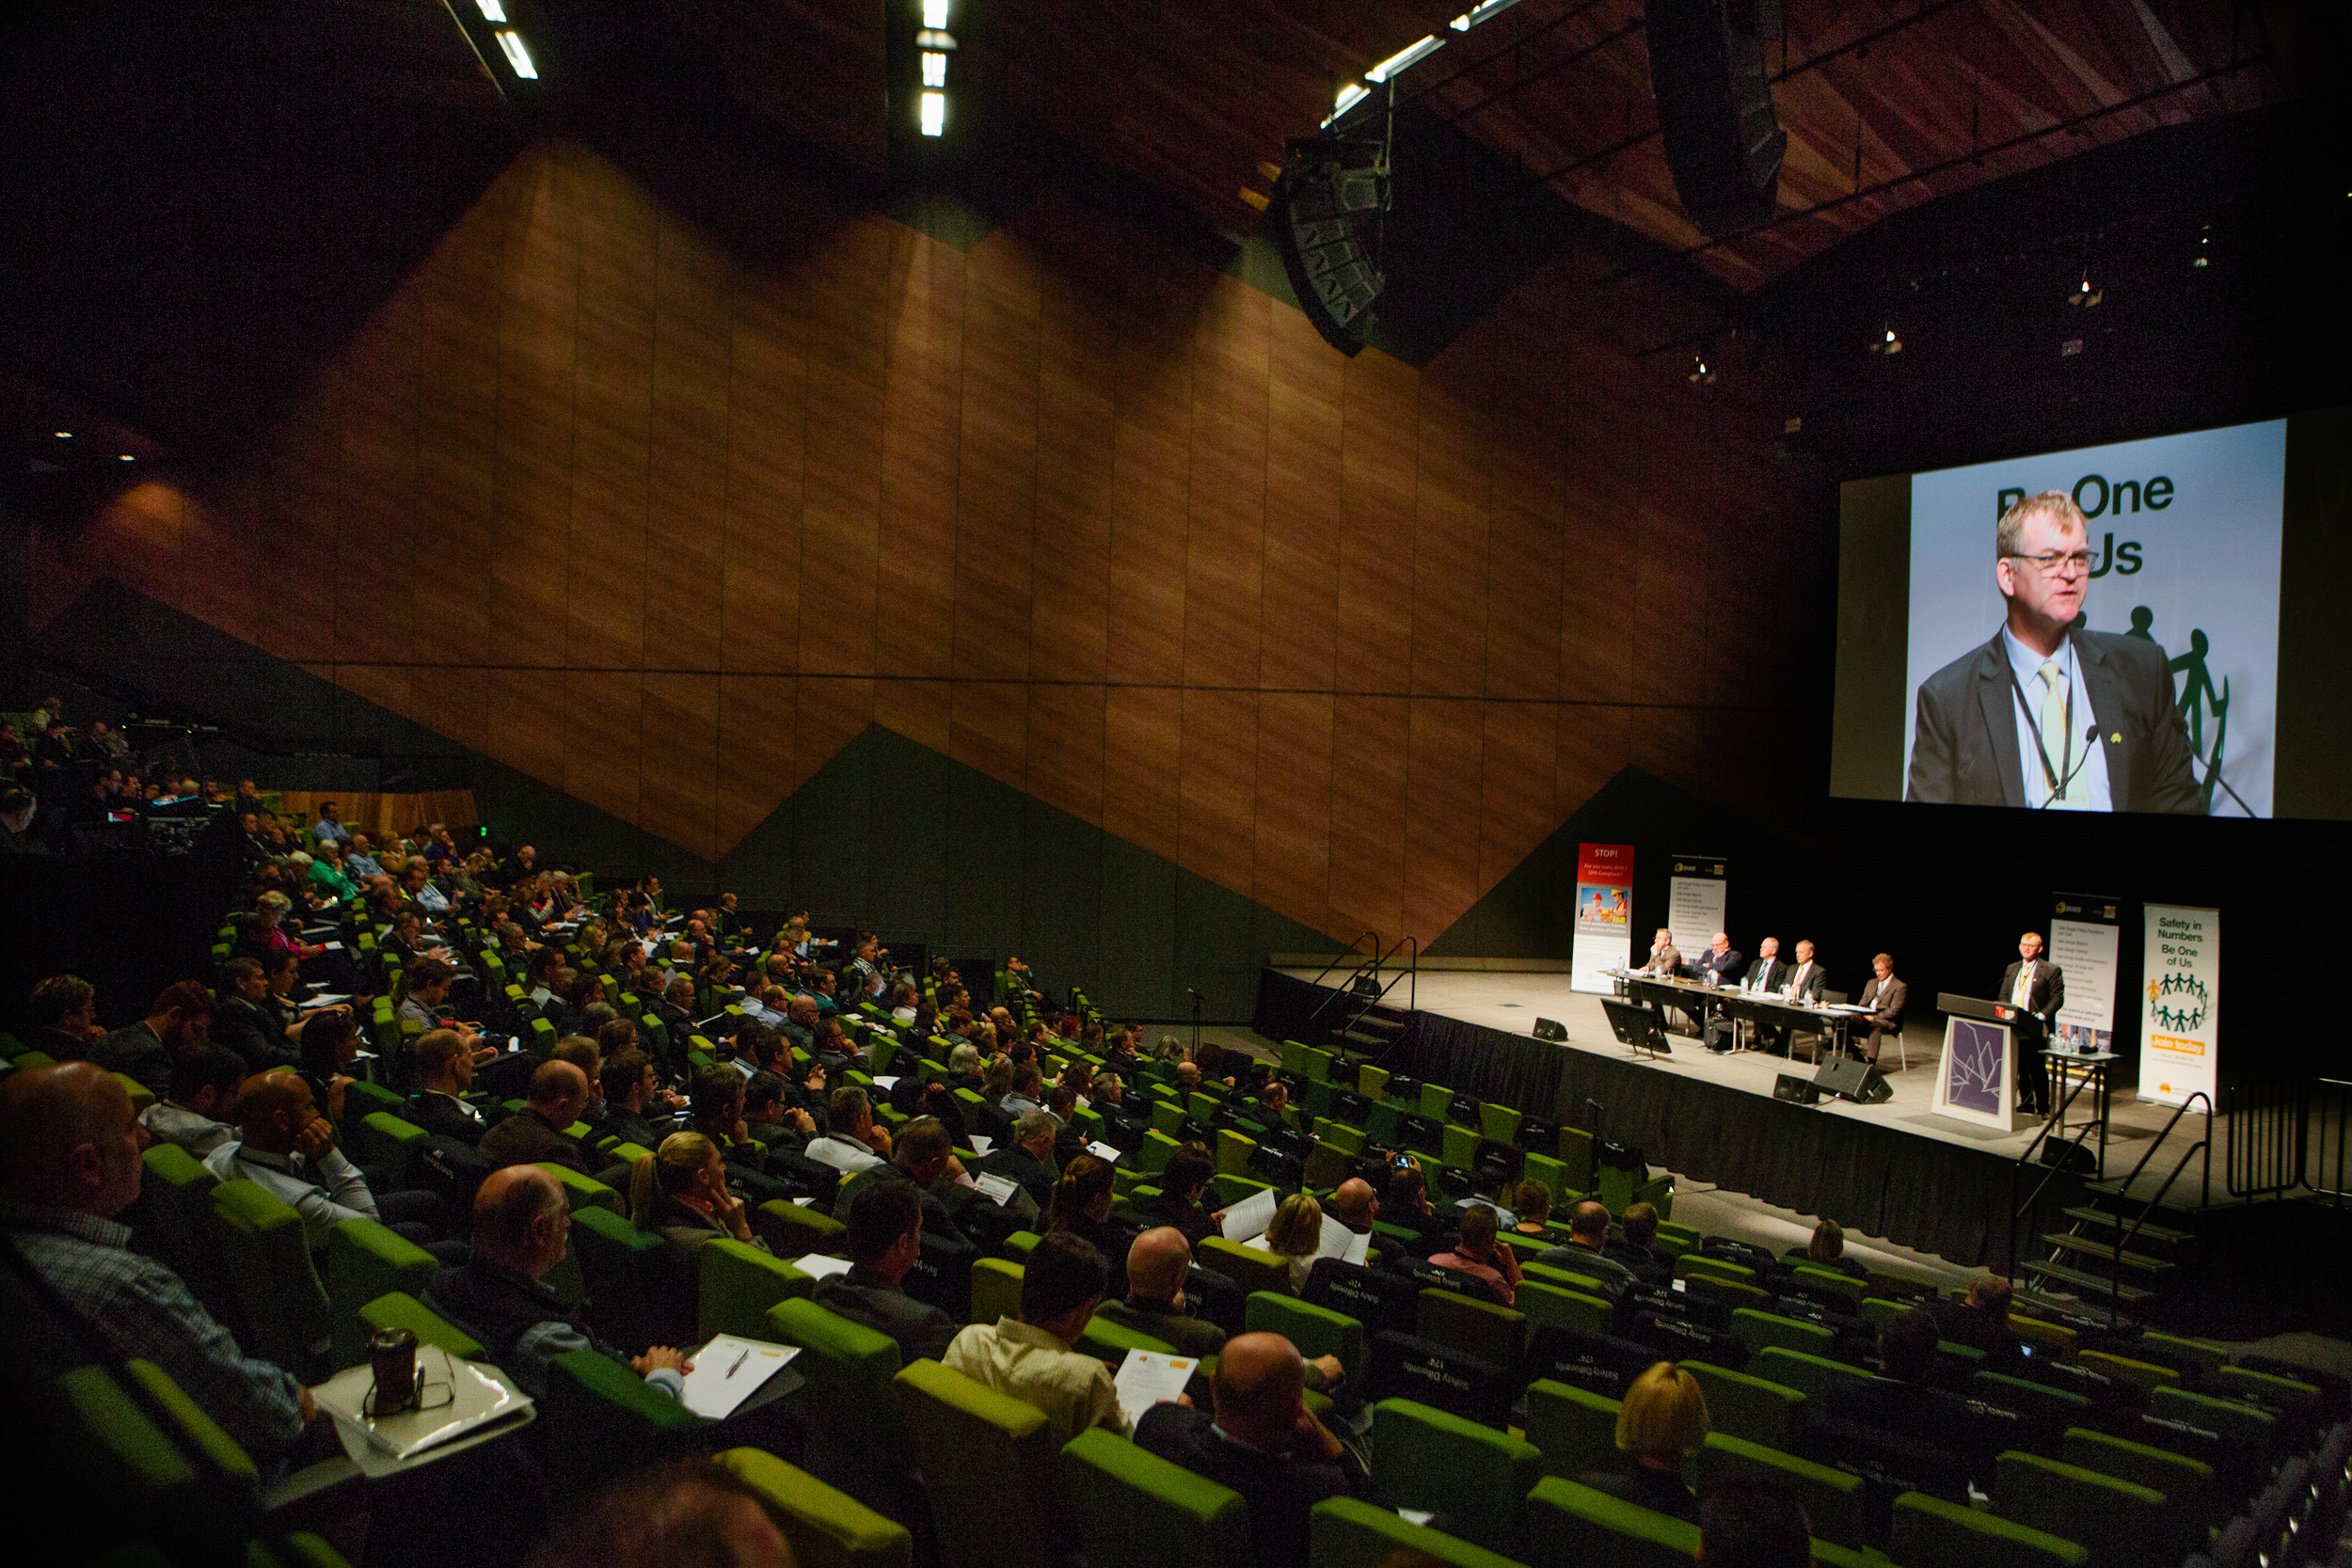 conferences-seminars-020.jpg